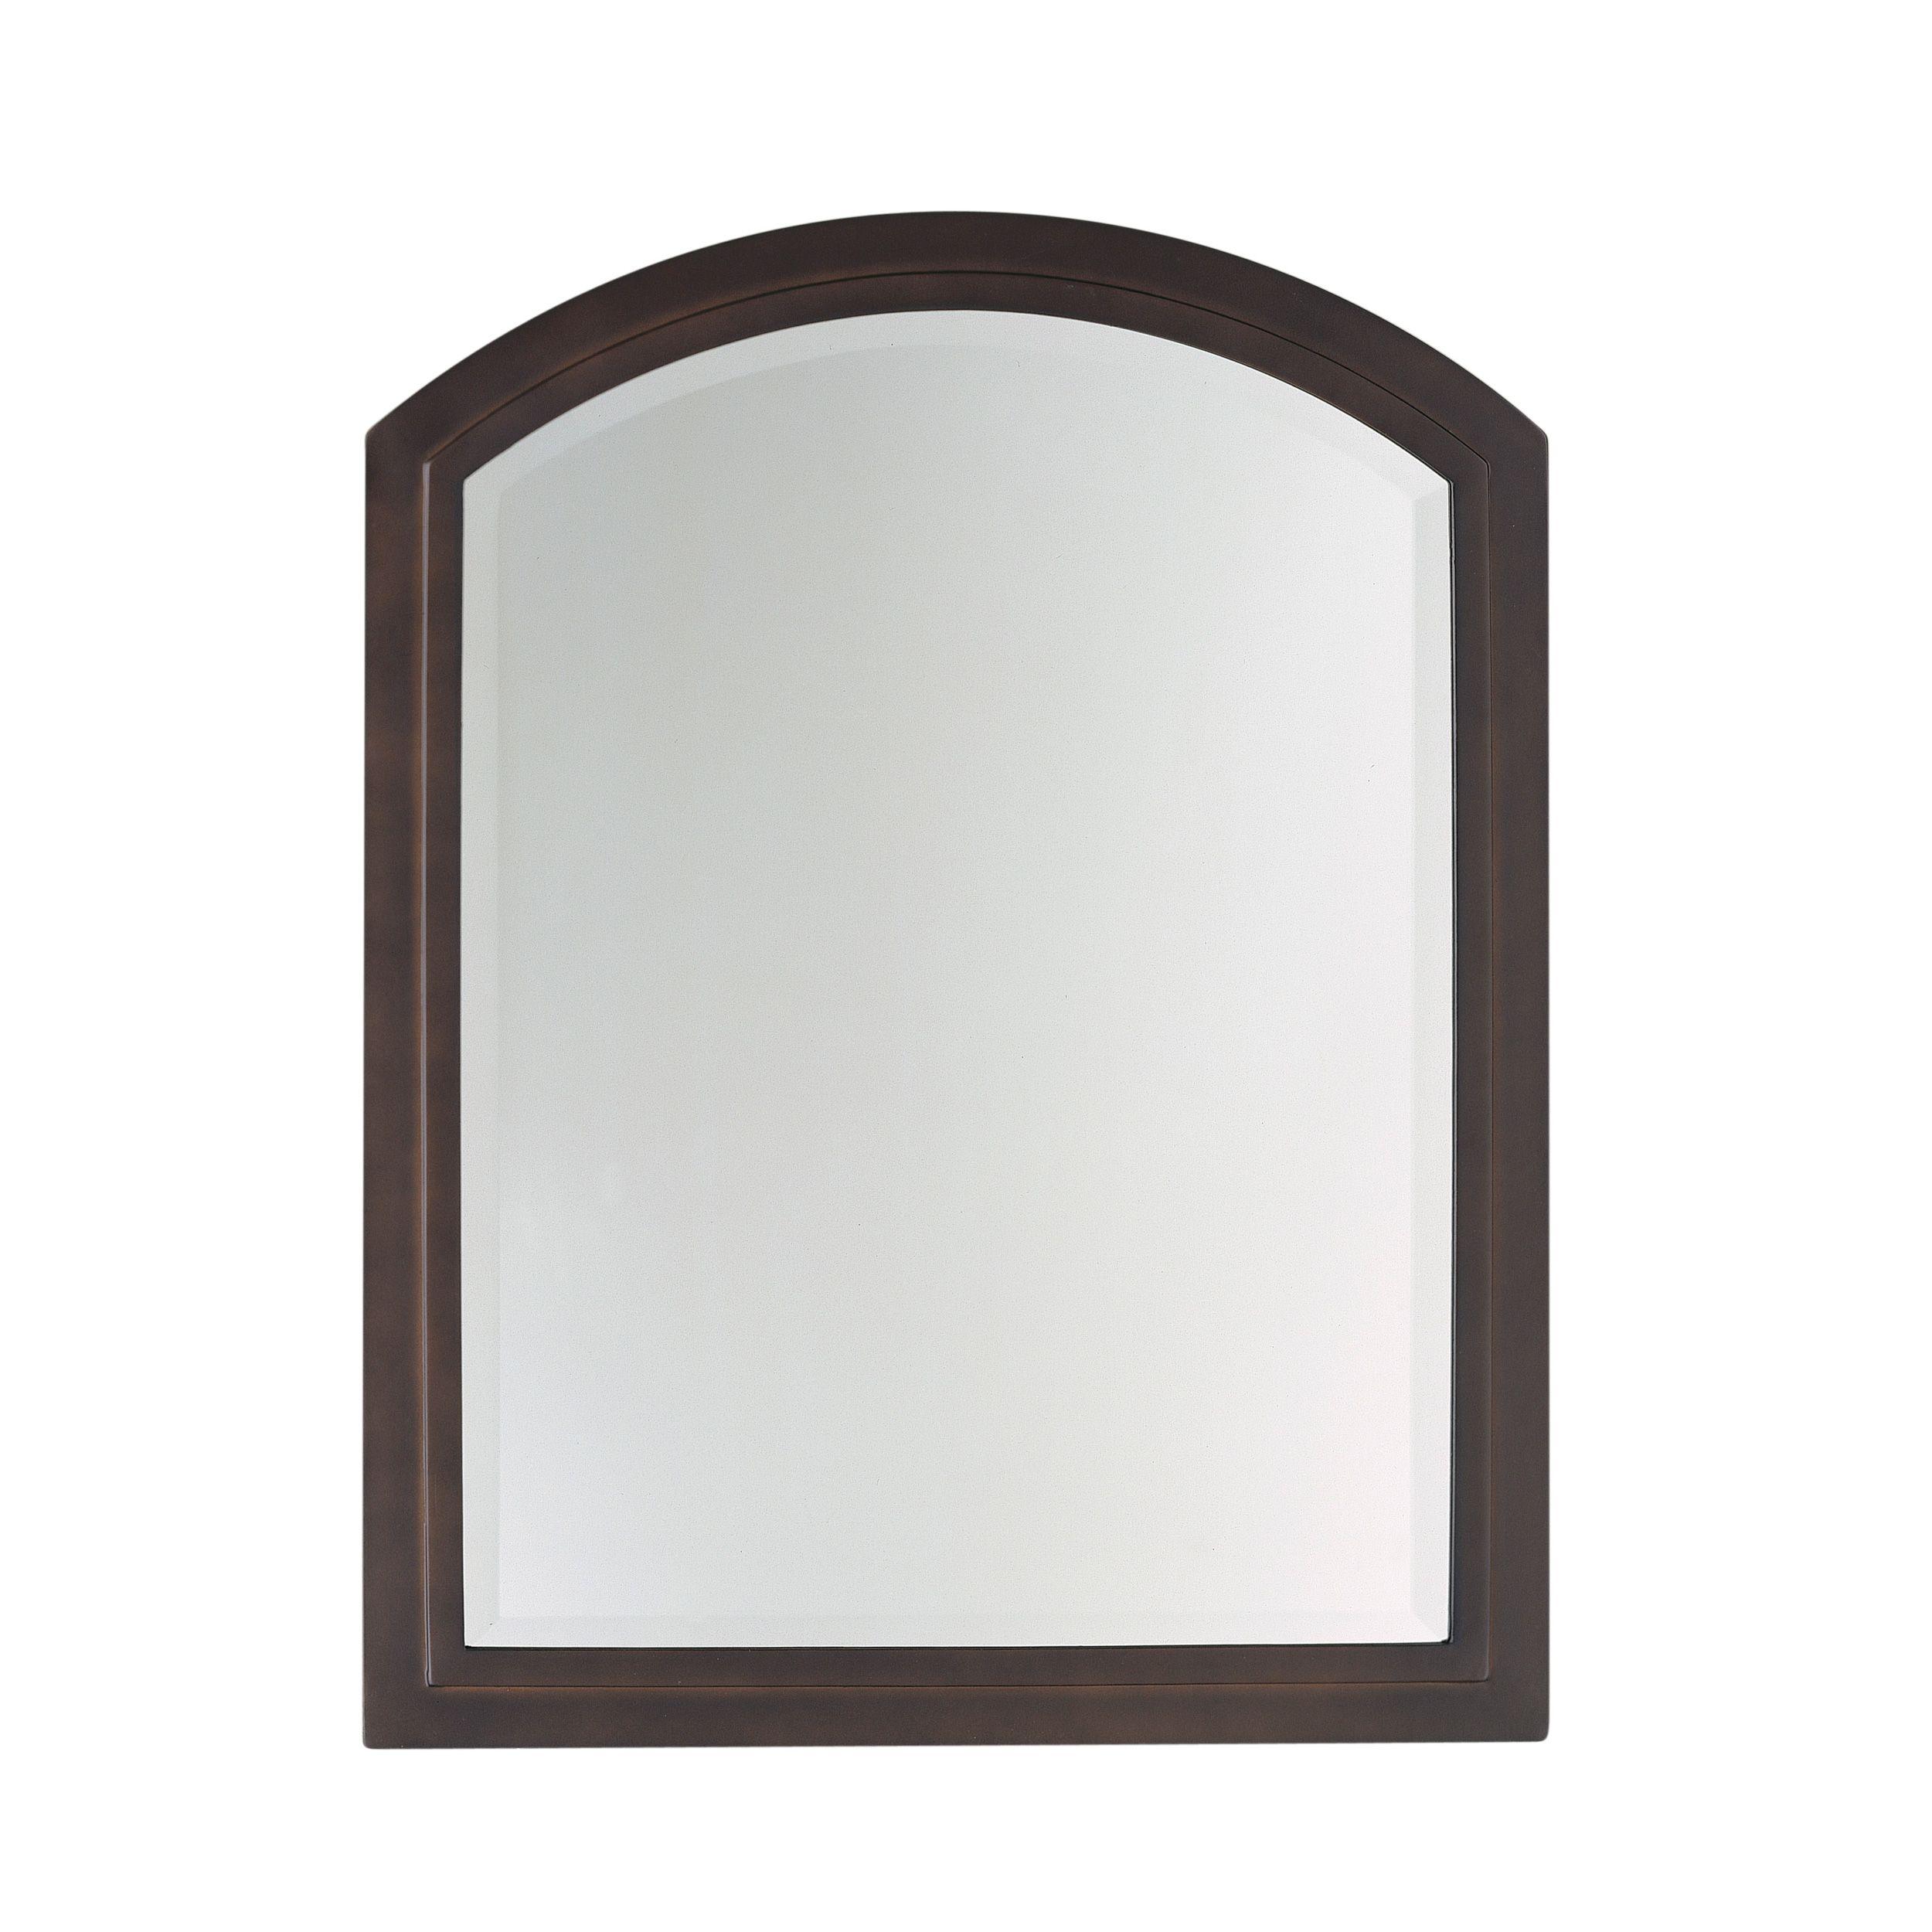 Feiss Mr1042orb Boulevard Oil Rubbed Bronze Beveled Mirror Mirror Beveled Mirror Bronze Mirror